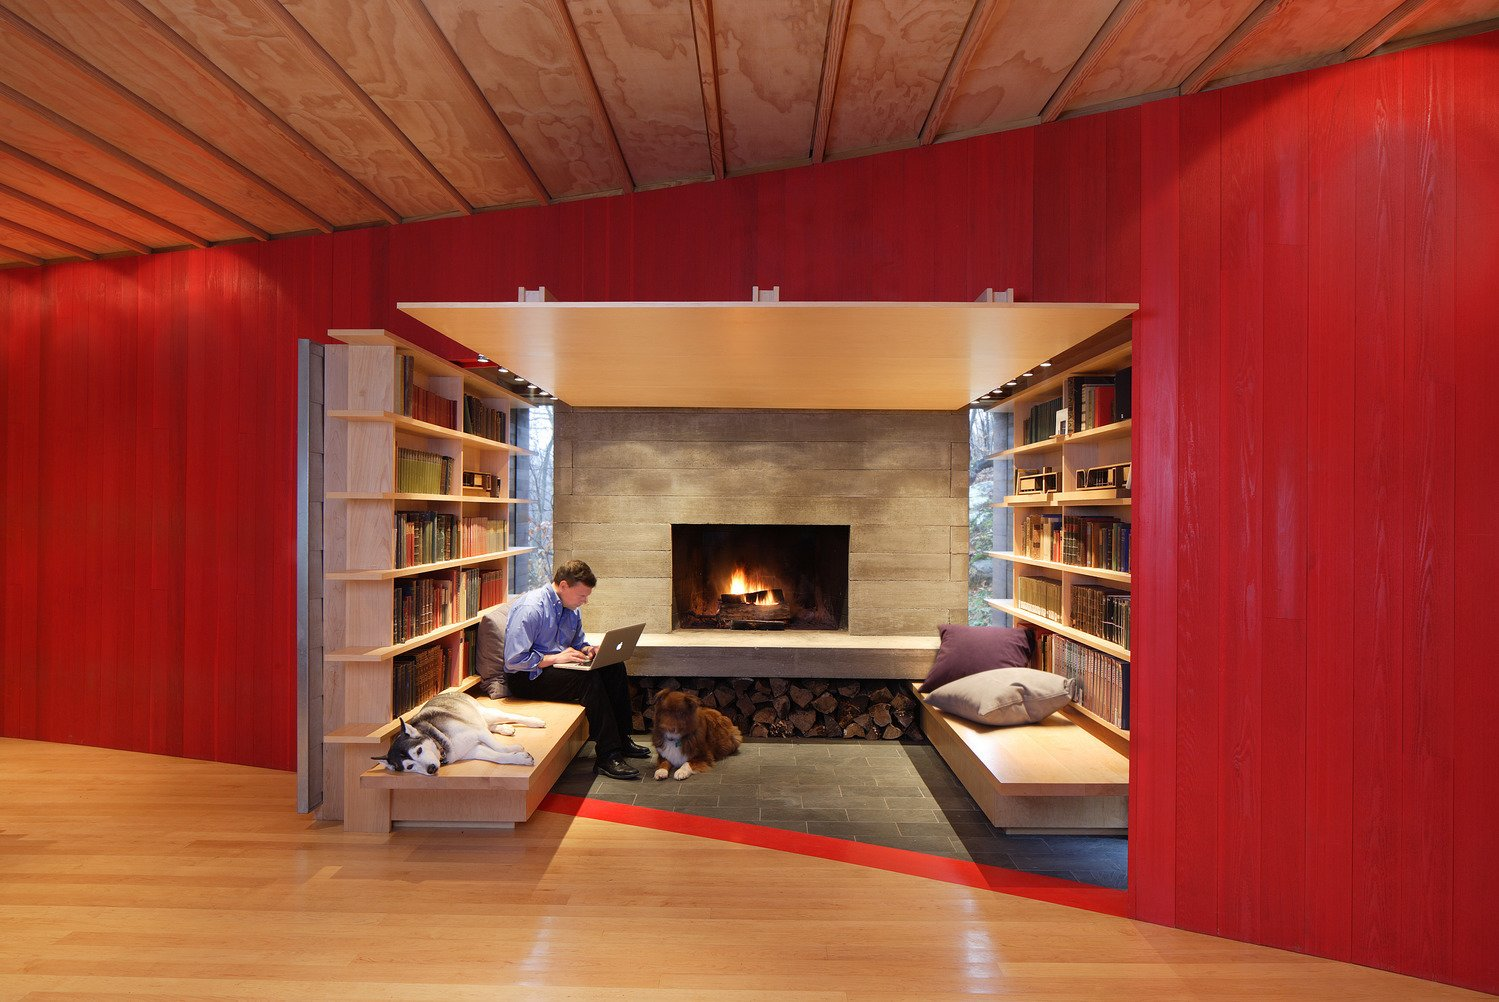 Living Room, Bench, Standard Layout Fireplace, Concrete Floor, and Light Hardwood Floor  Edge House by Bohlin Cywinski Jackson